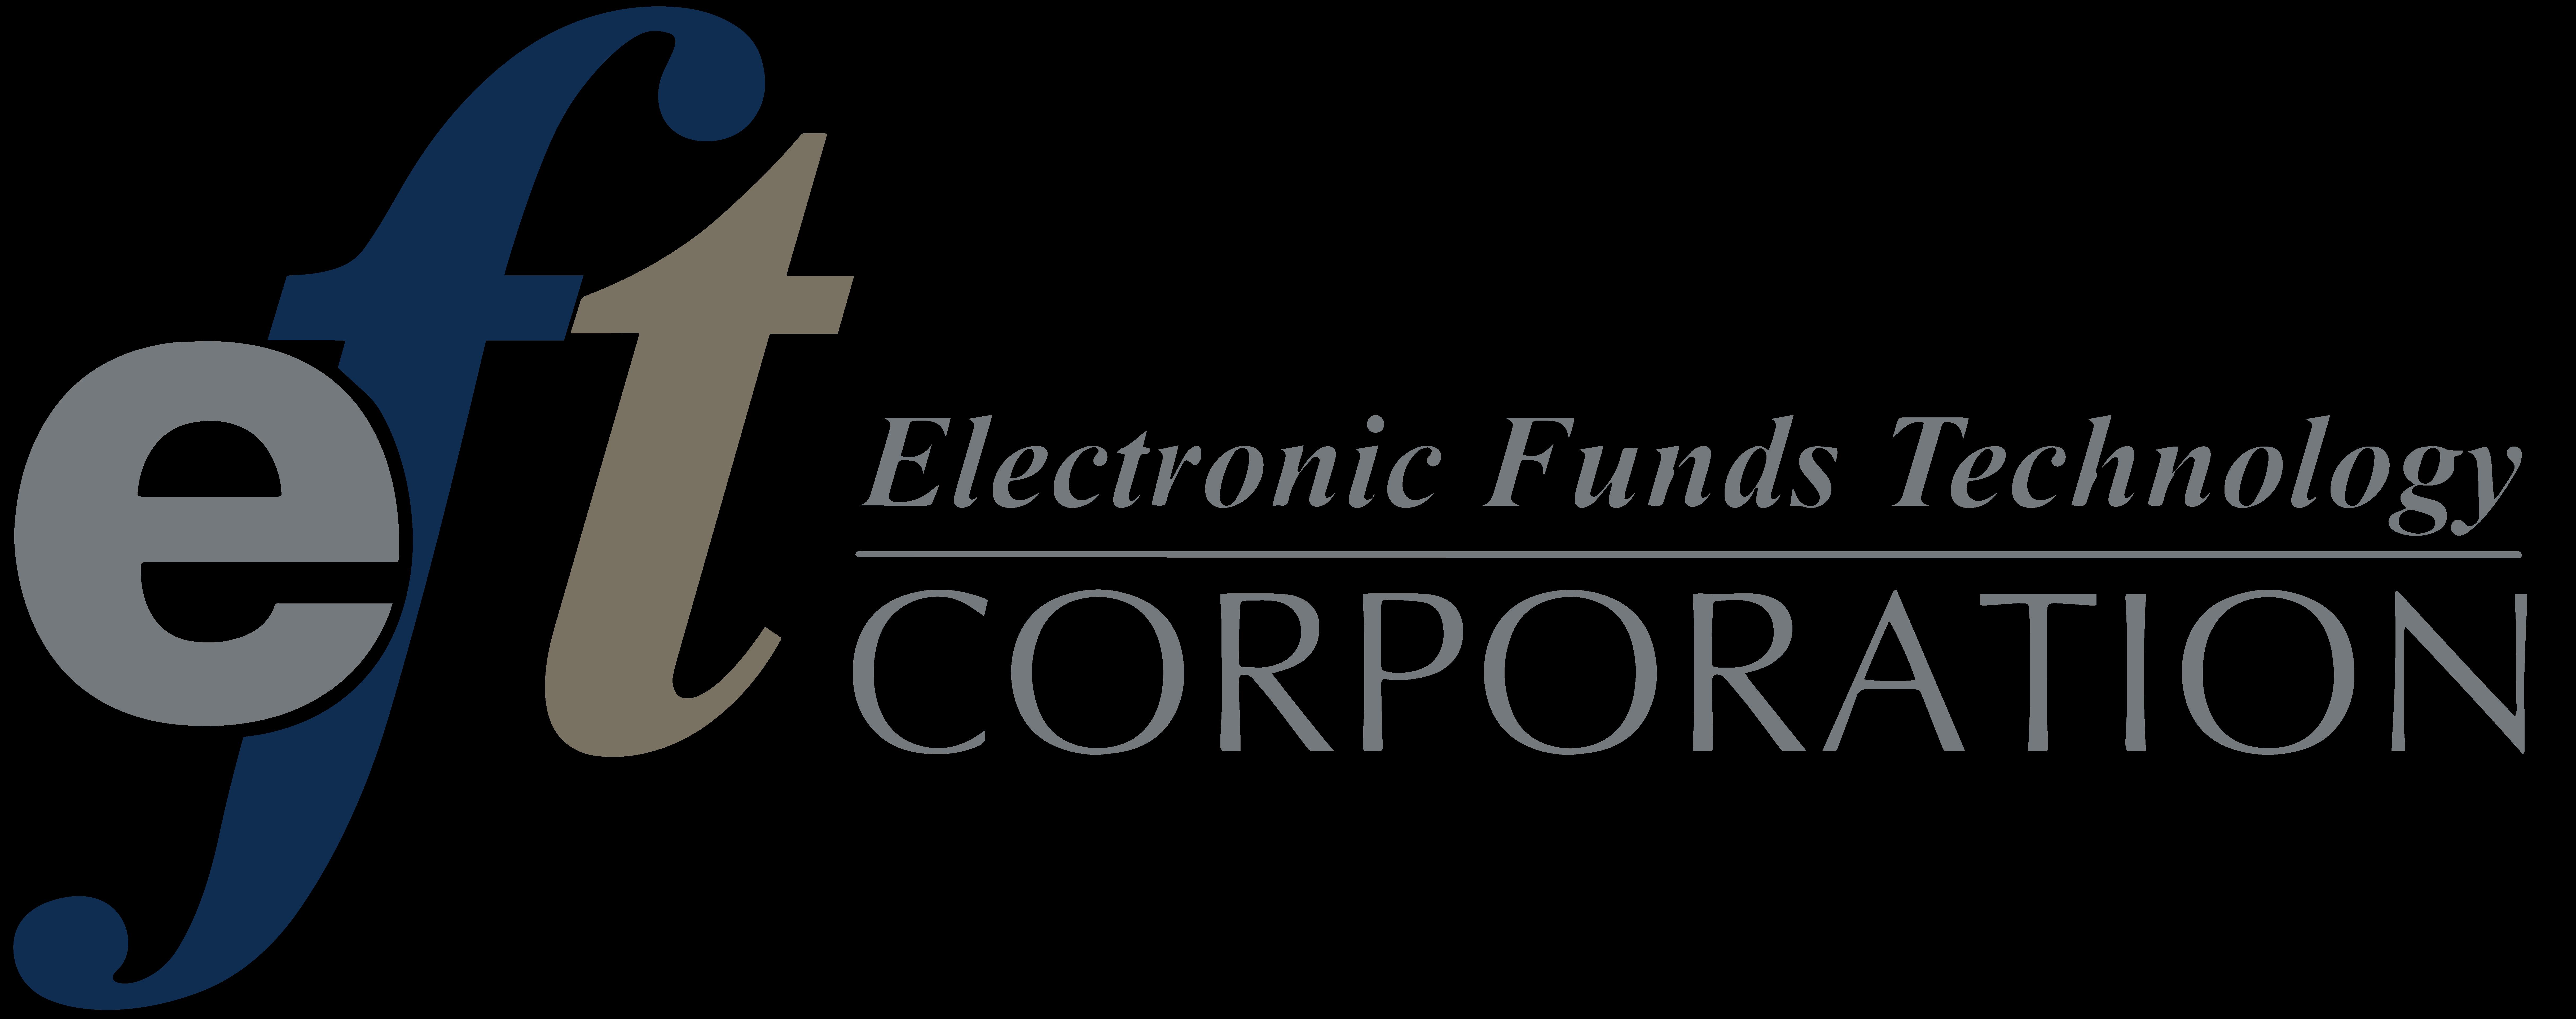 EFT Corp